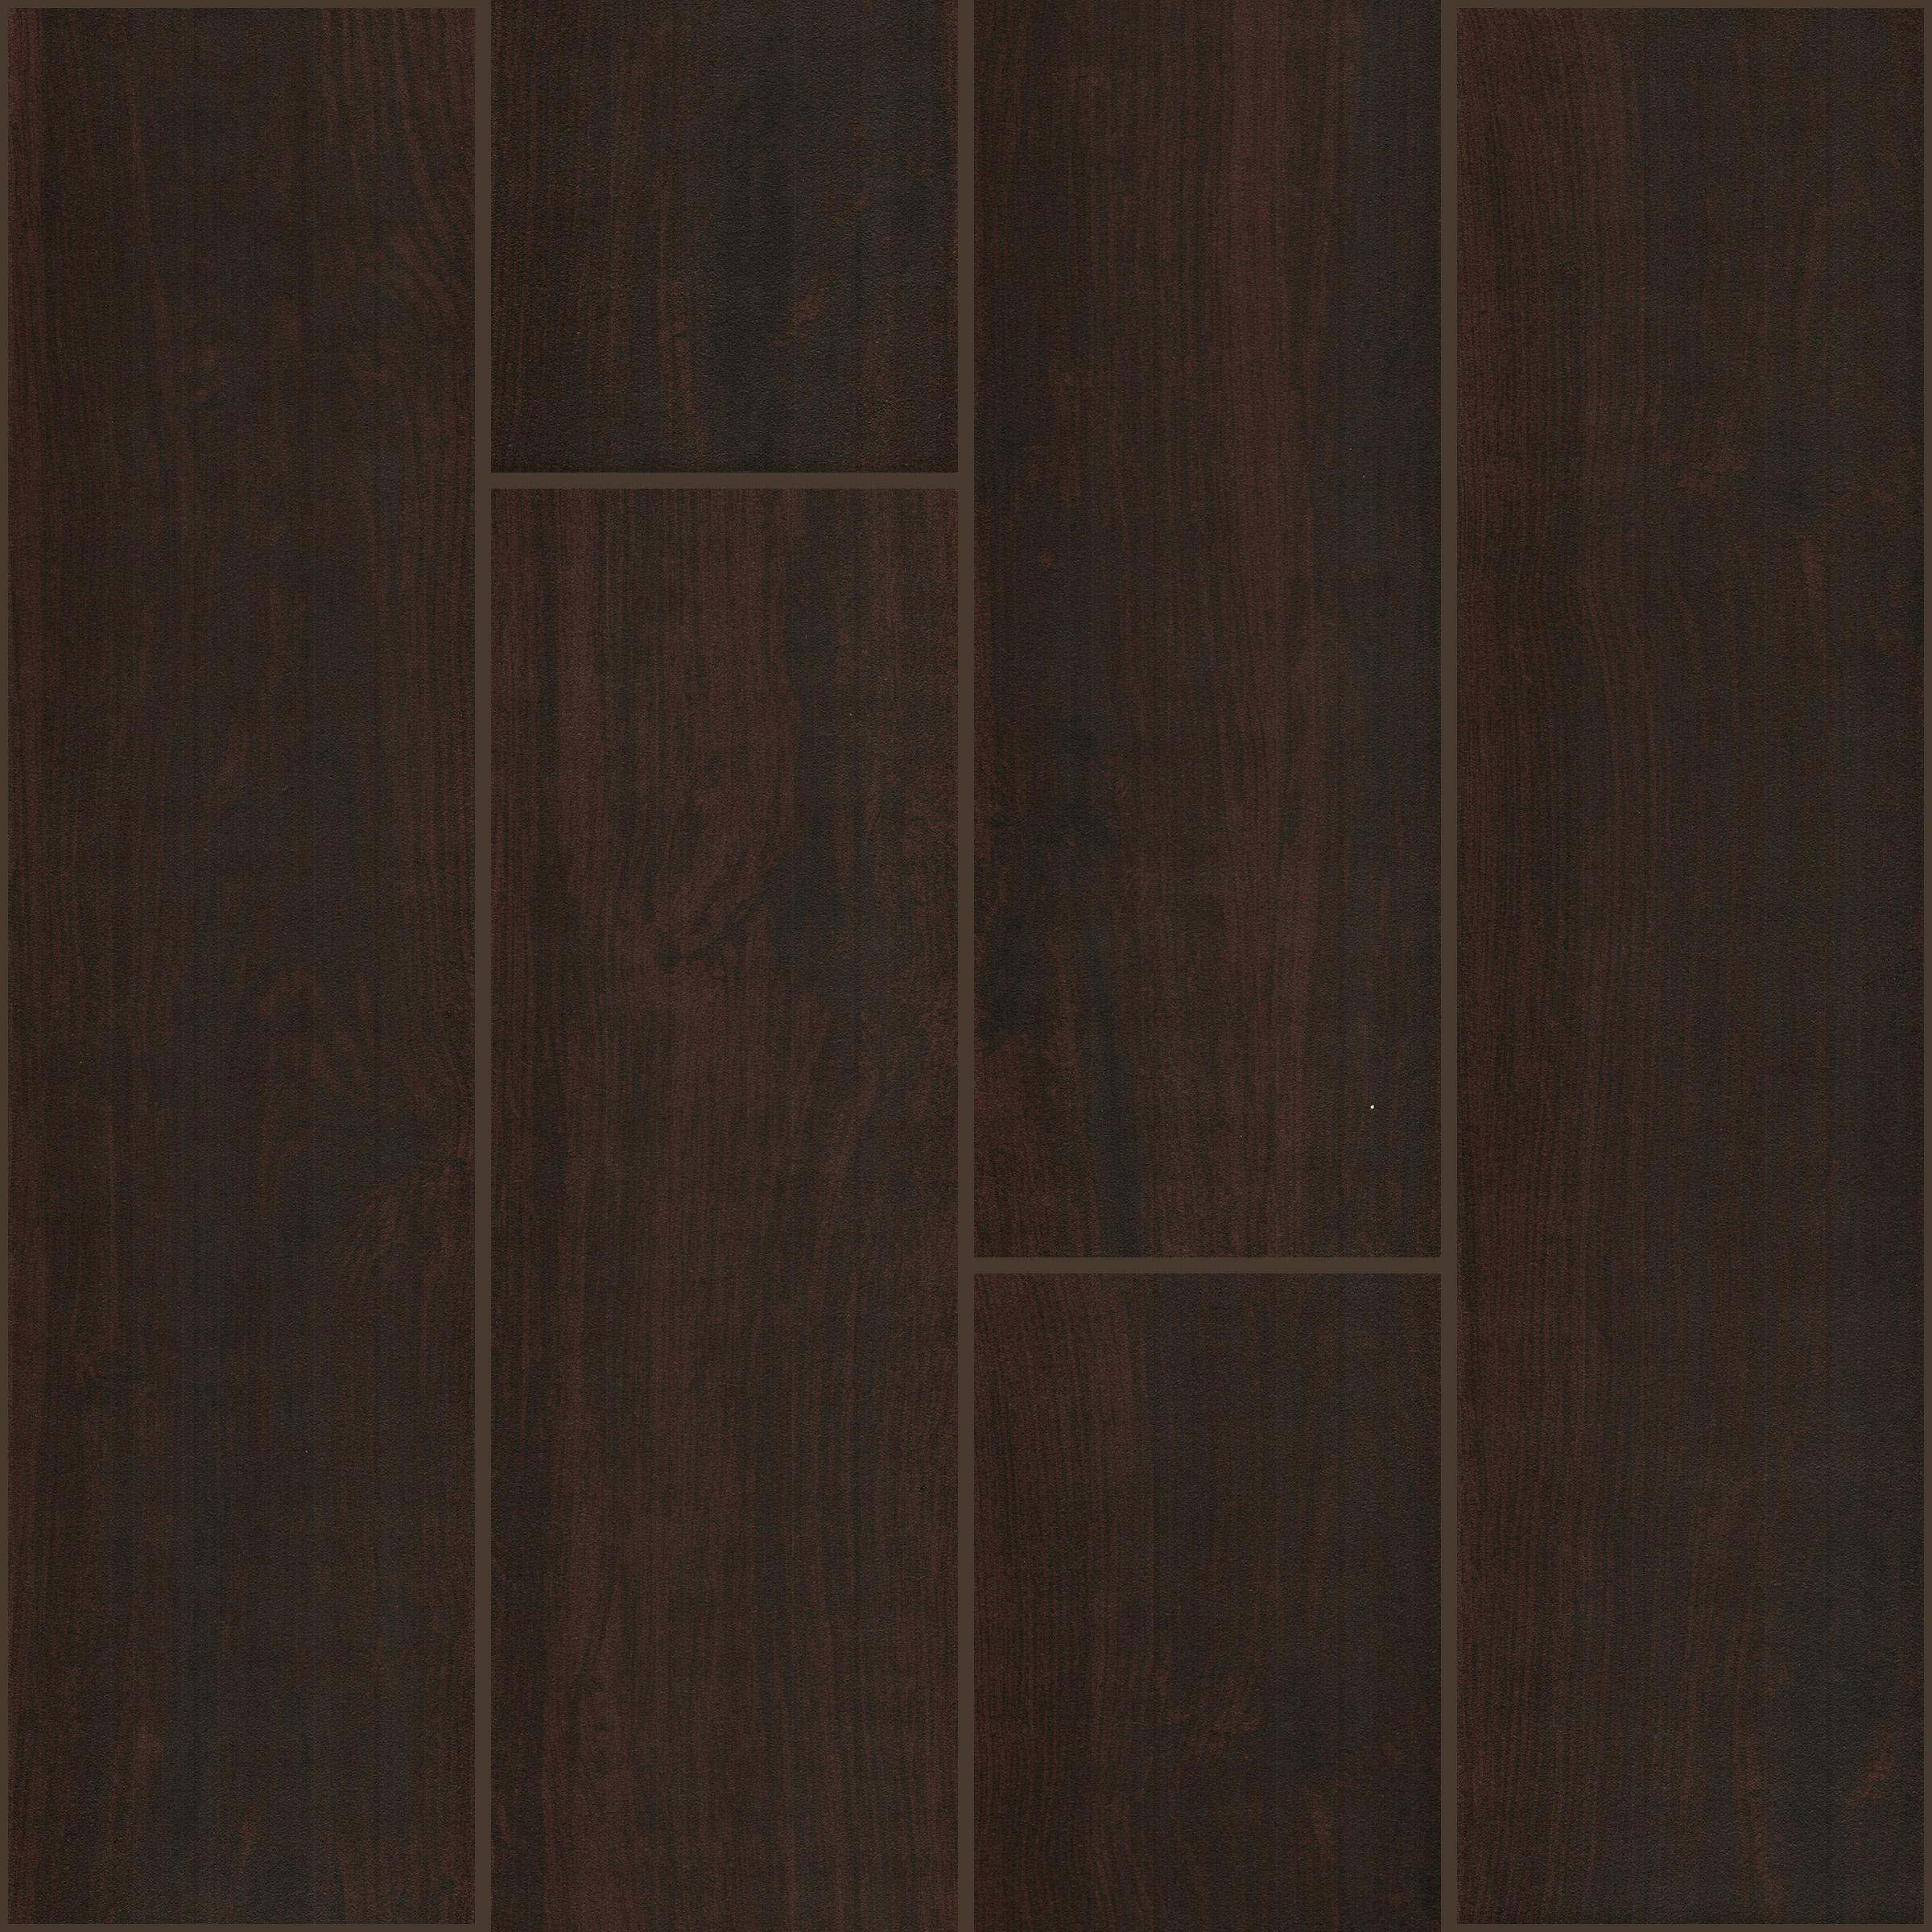 Florim Black Walnut 6 X 24 Wood Look Porcelain Tile Wood